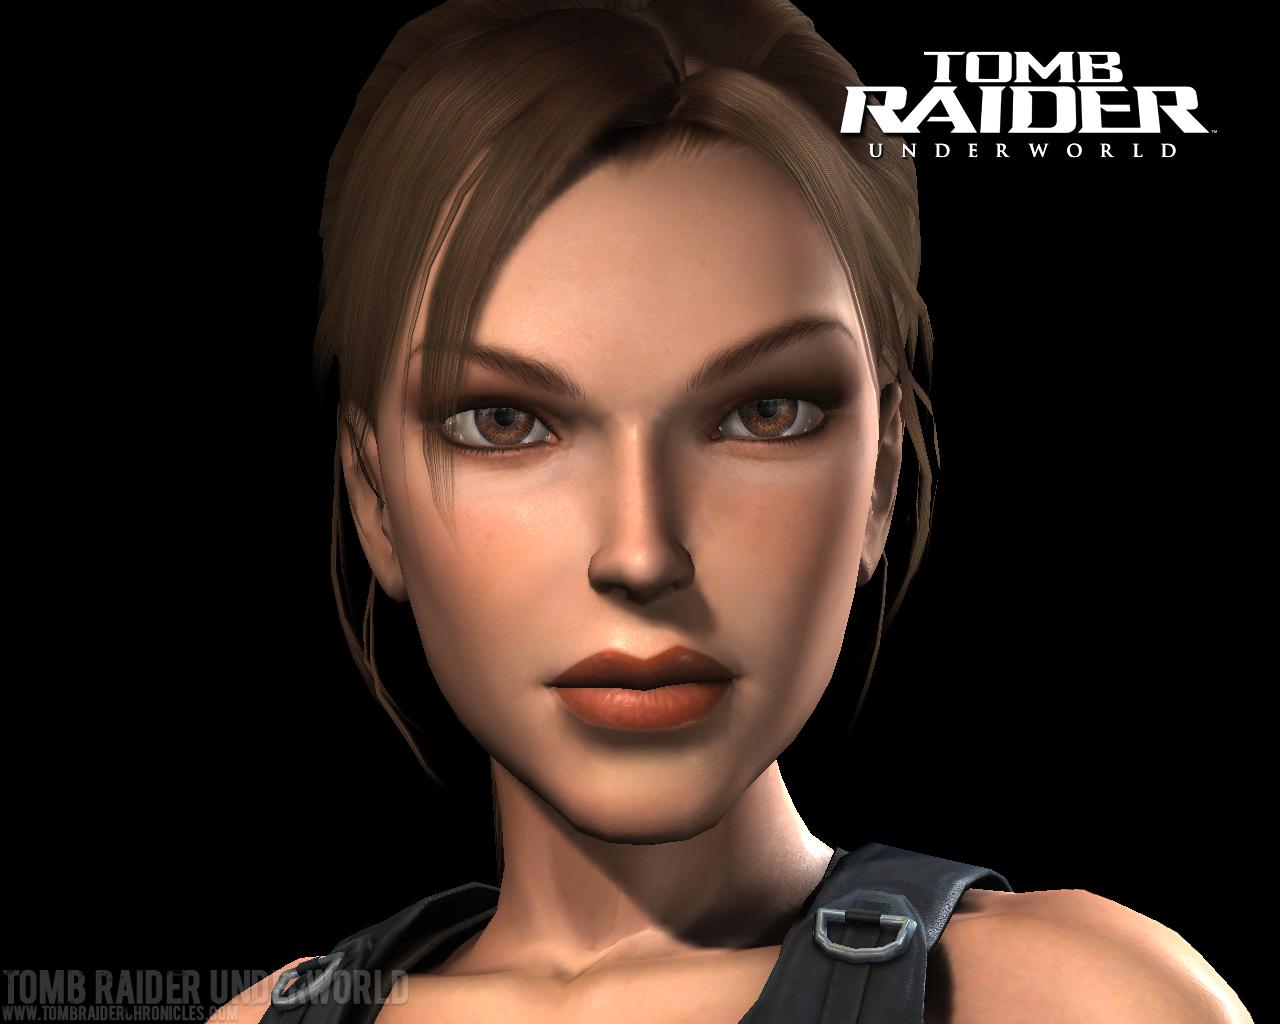 Lara croft underworld erotic scene